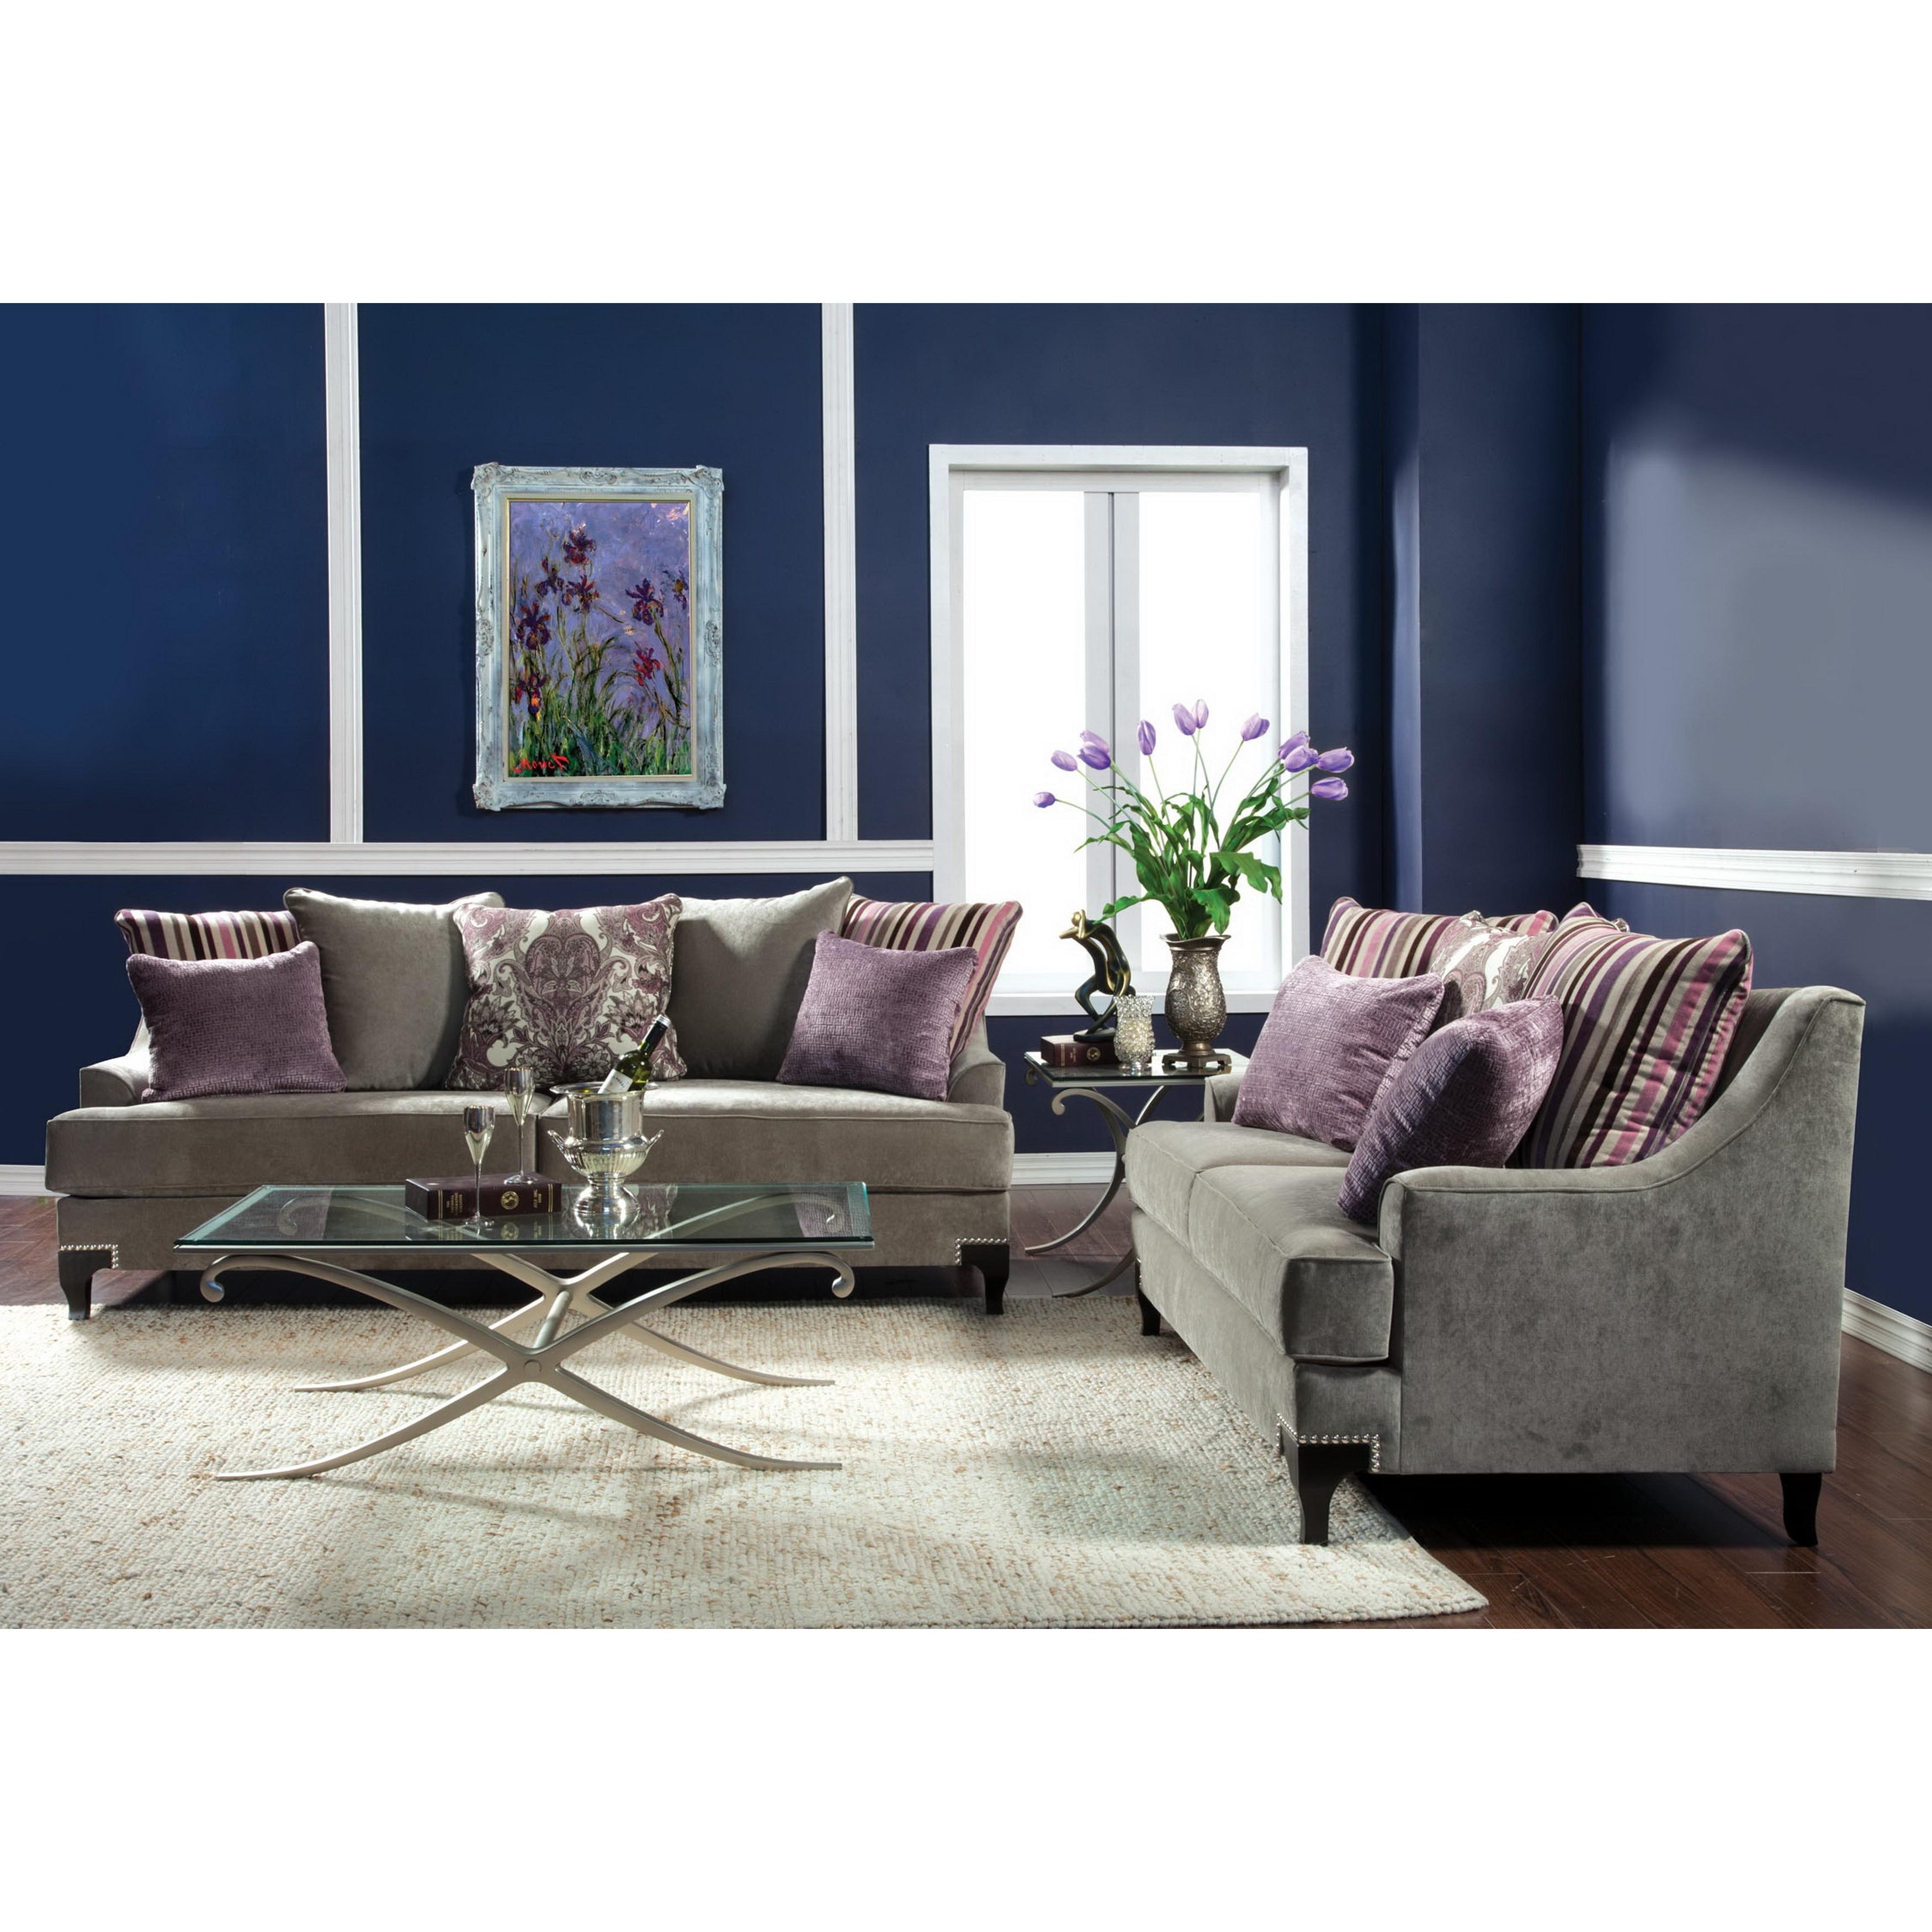 Furniture of america visconti 2 piece velvet sofa and loveseat set